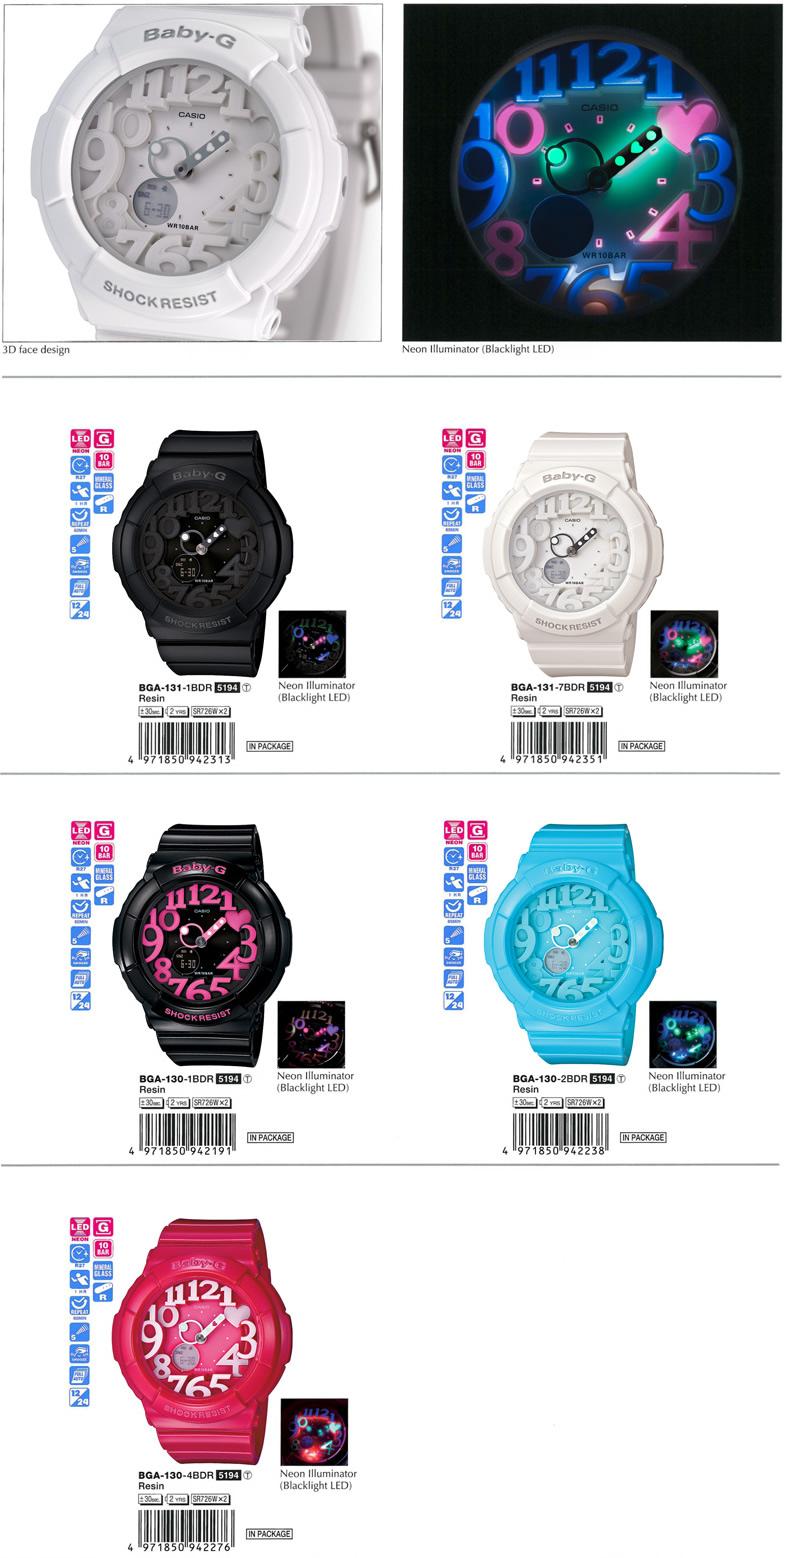 7a46abe103b3 Dinamika Watches Shop: Casio Baby-G Black Neon Illuminator Alarm ...